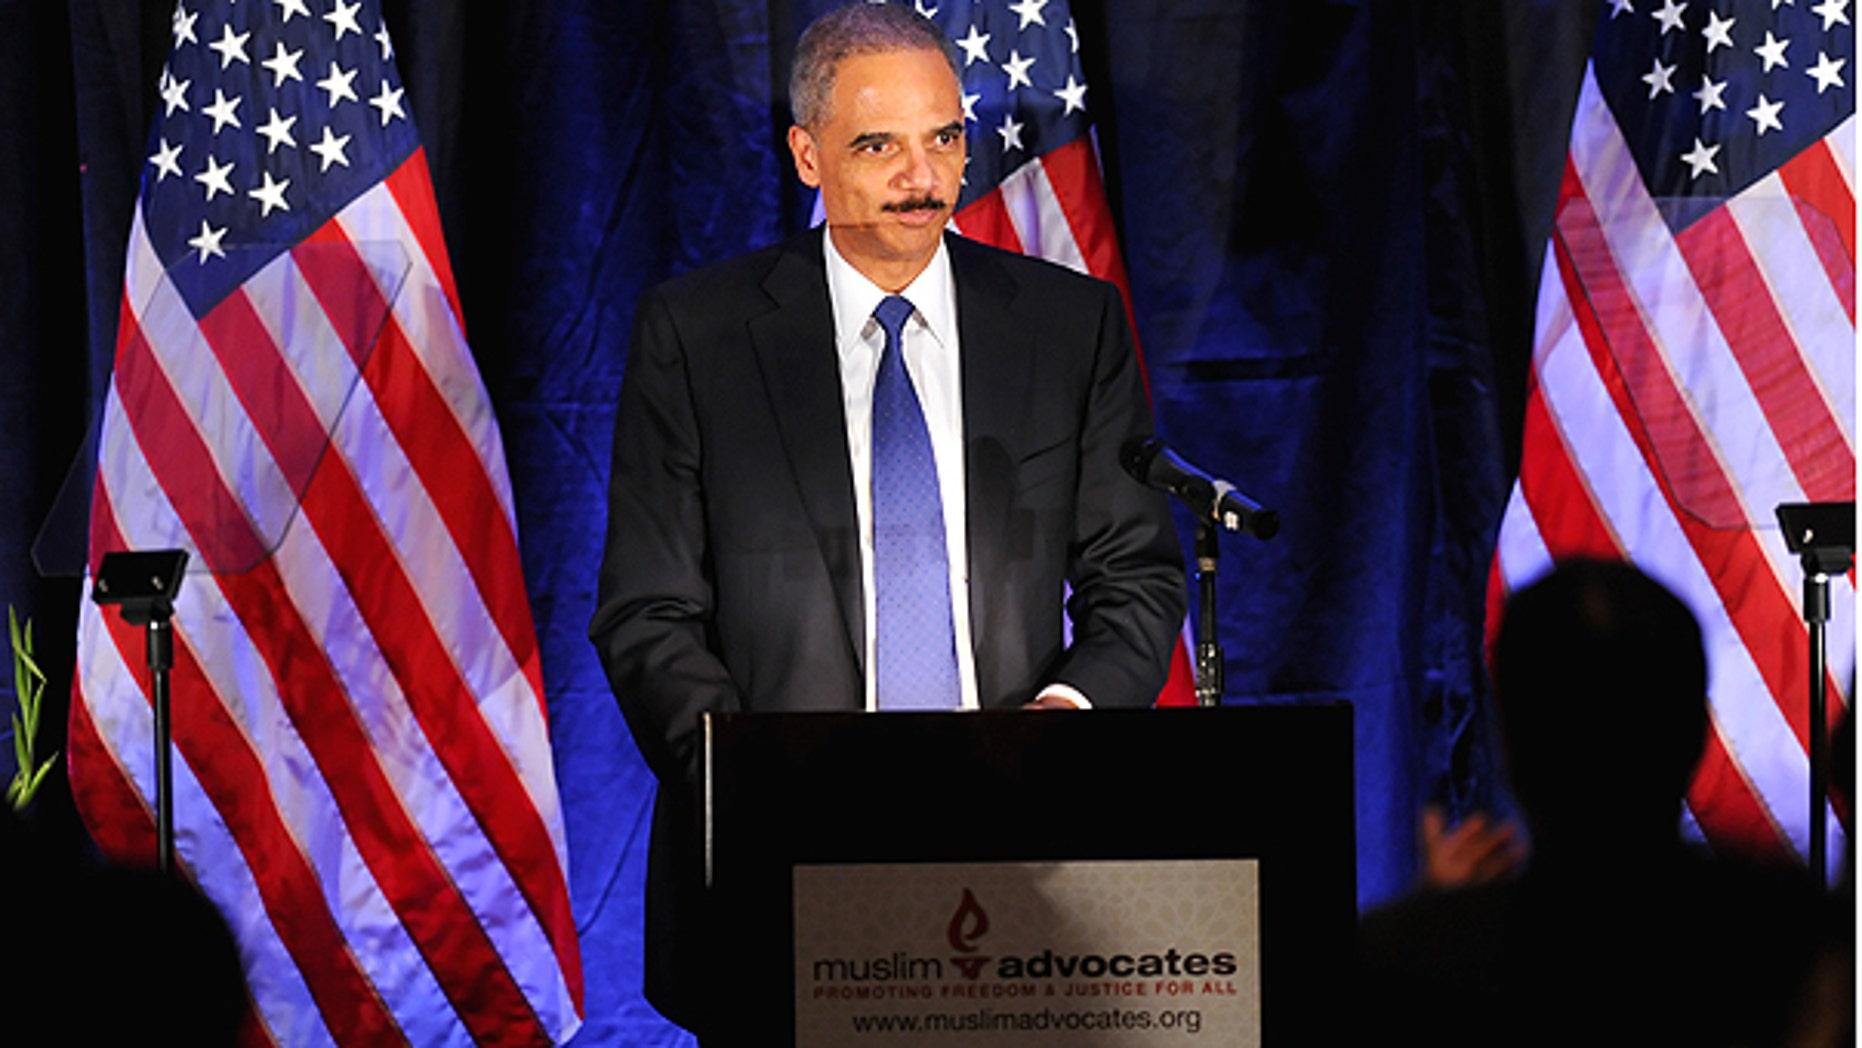 Dec. 10: Attorney General Eric Holder speaks at the Muslim Advocates annual dinner in Millbrae, Calif.